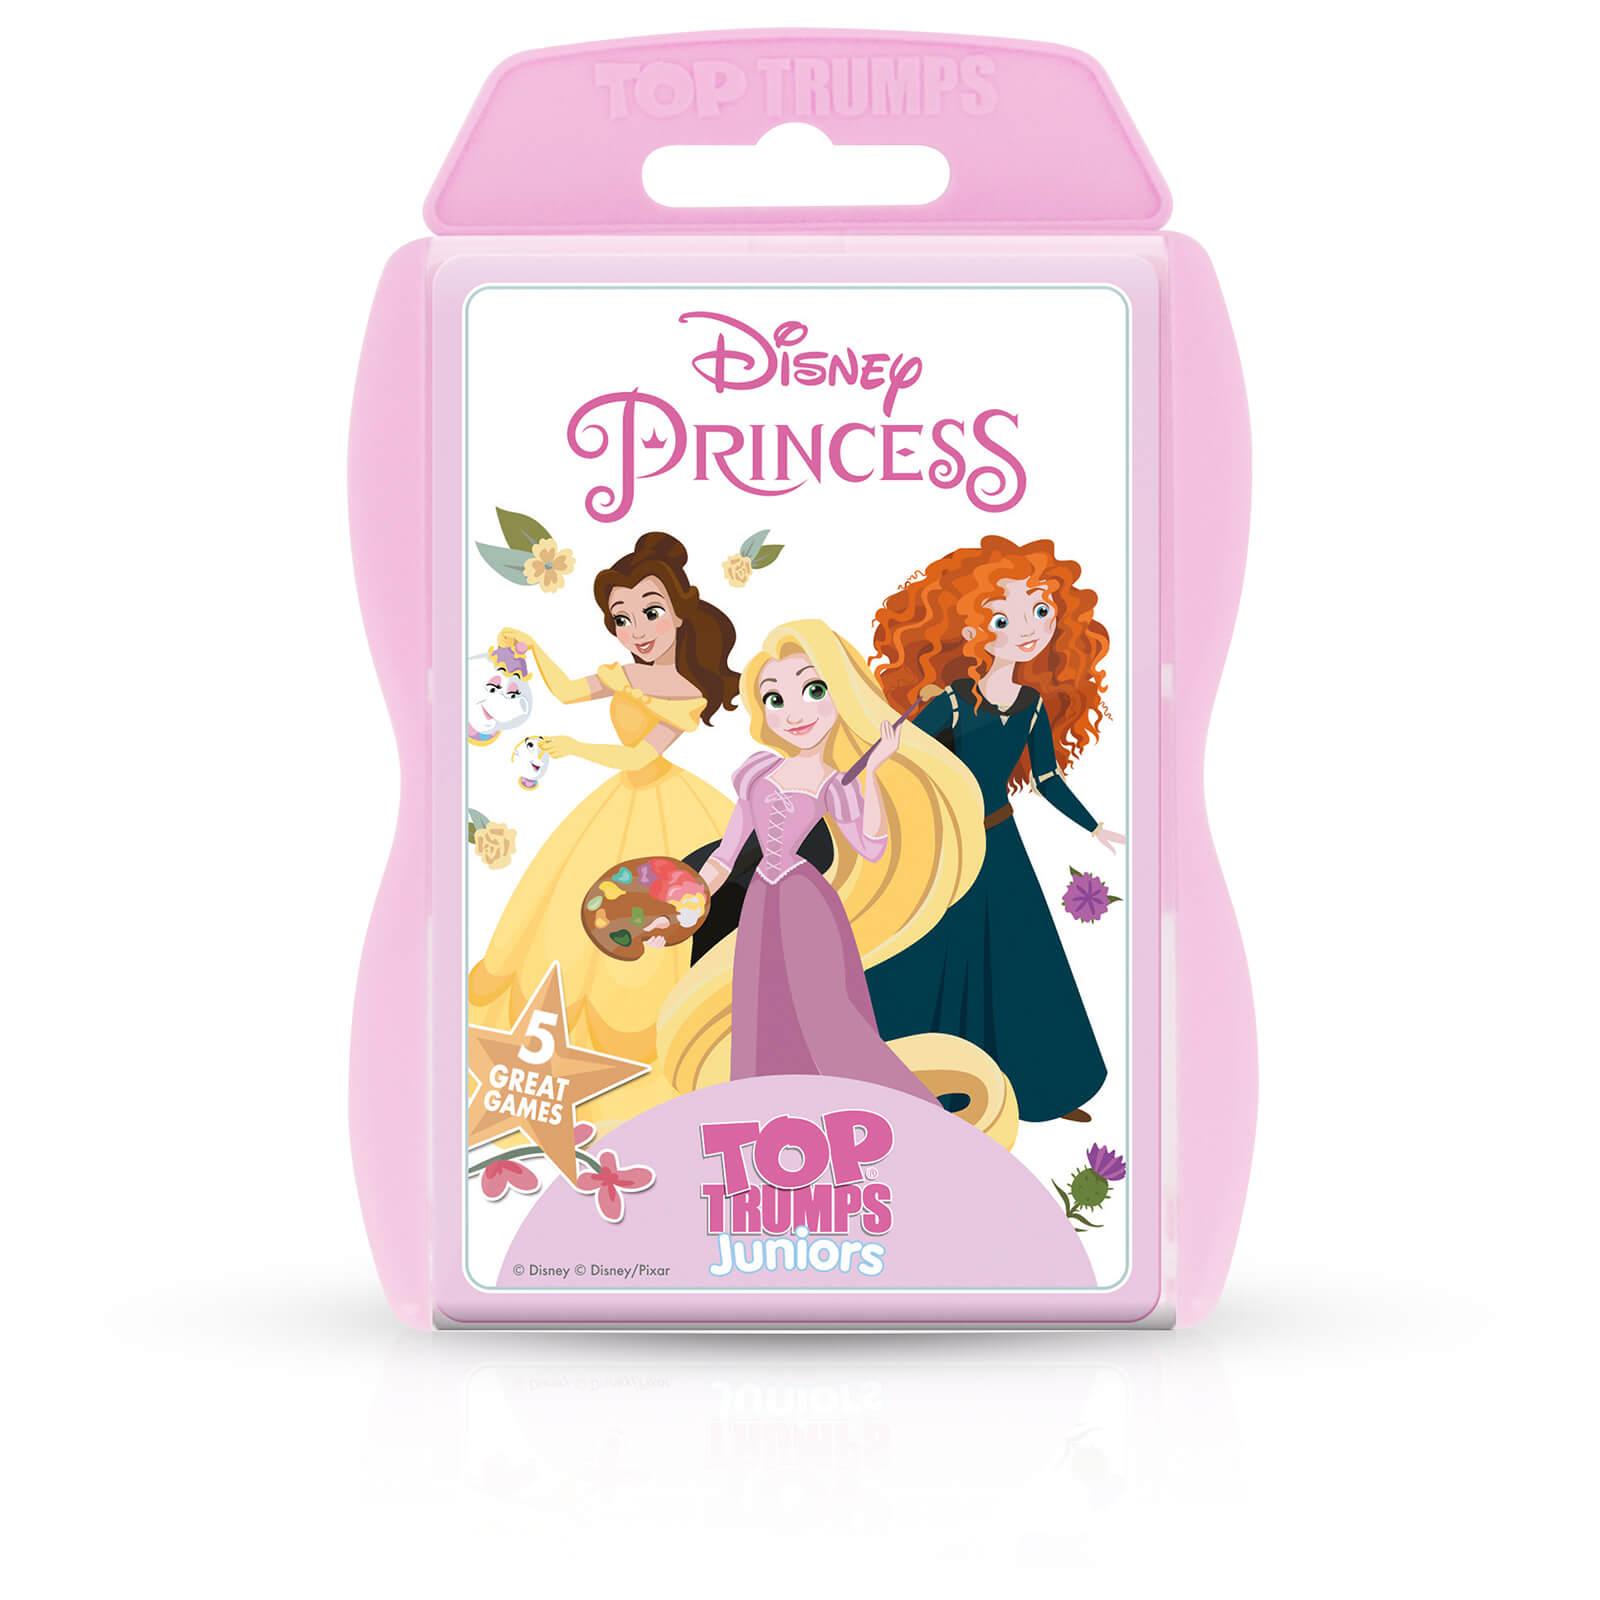 Image of Top Trumps Junior Card Game - Disney Princess Edition